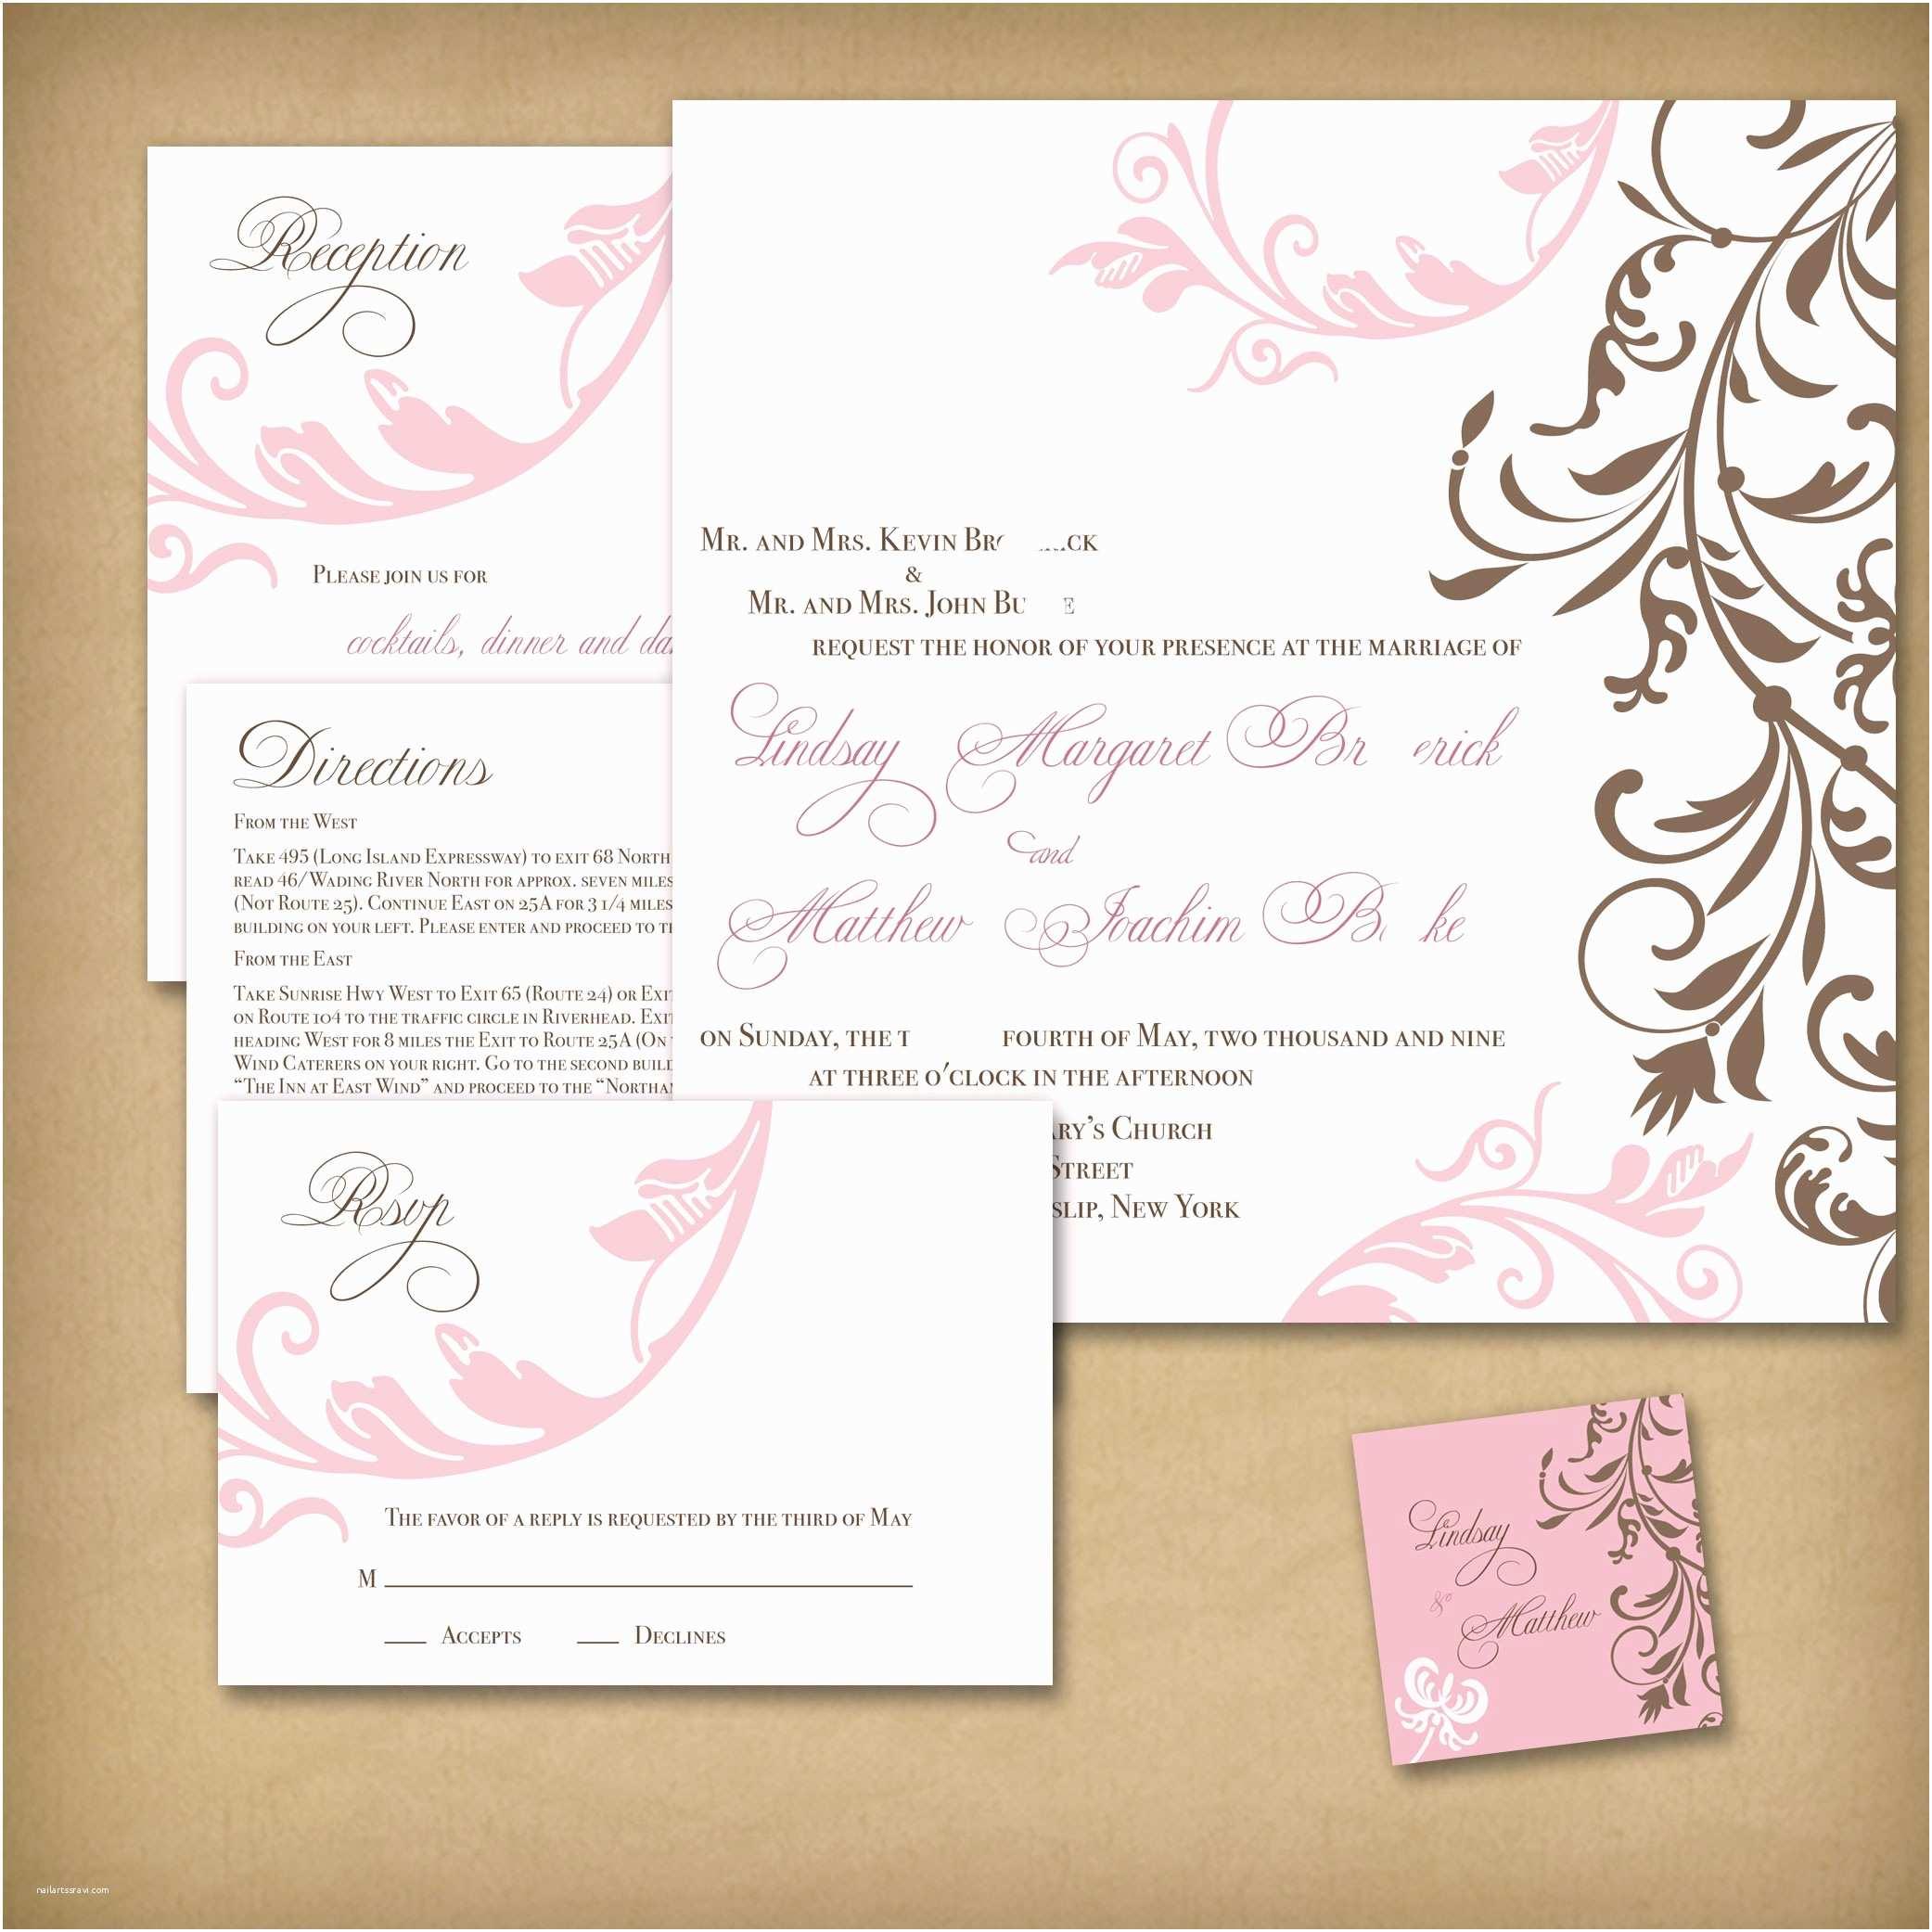 Wedding Invitation Ecards Create Easy Standard Wedding Invitation Size Designs